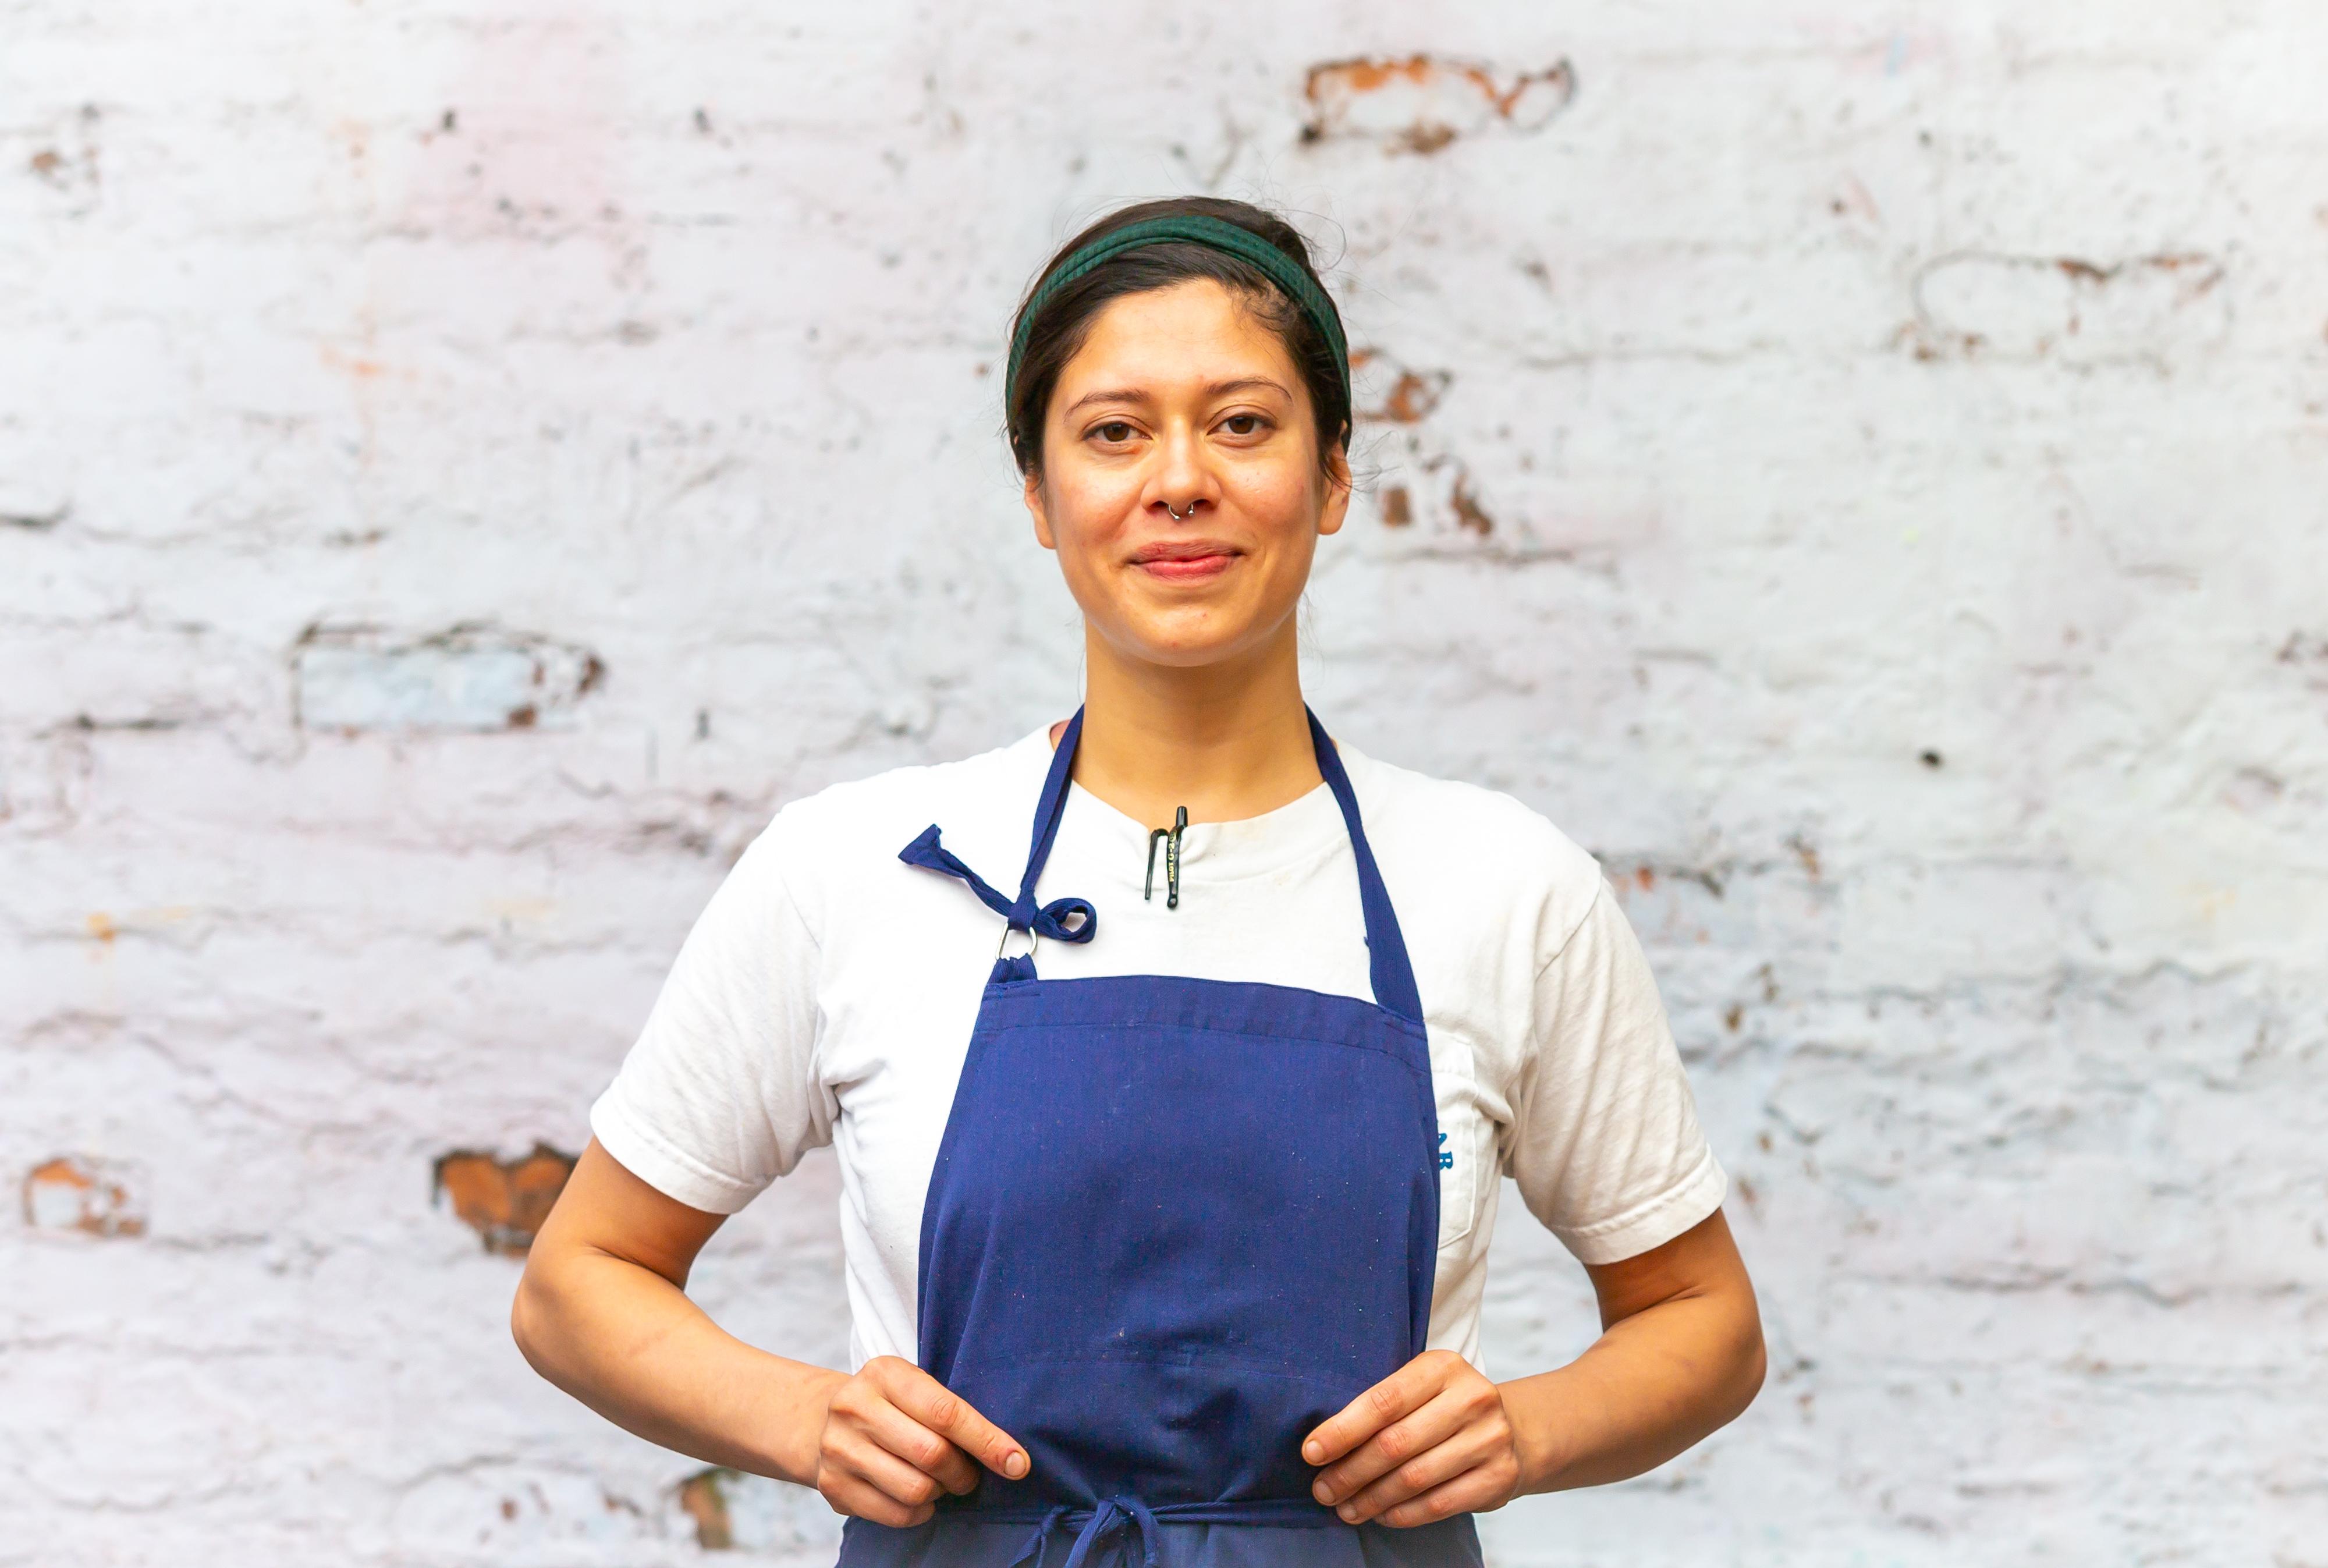 Chicomecoatl pop-up founder and 8ARM chef Maricela Vega